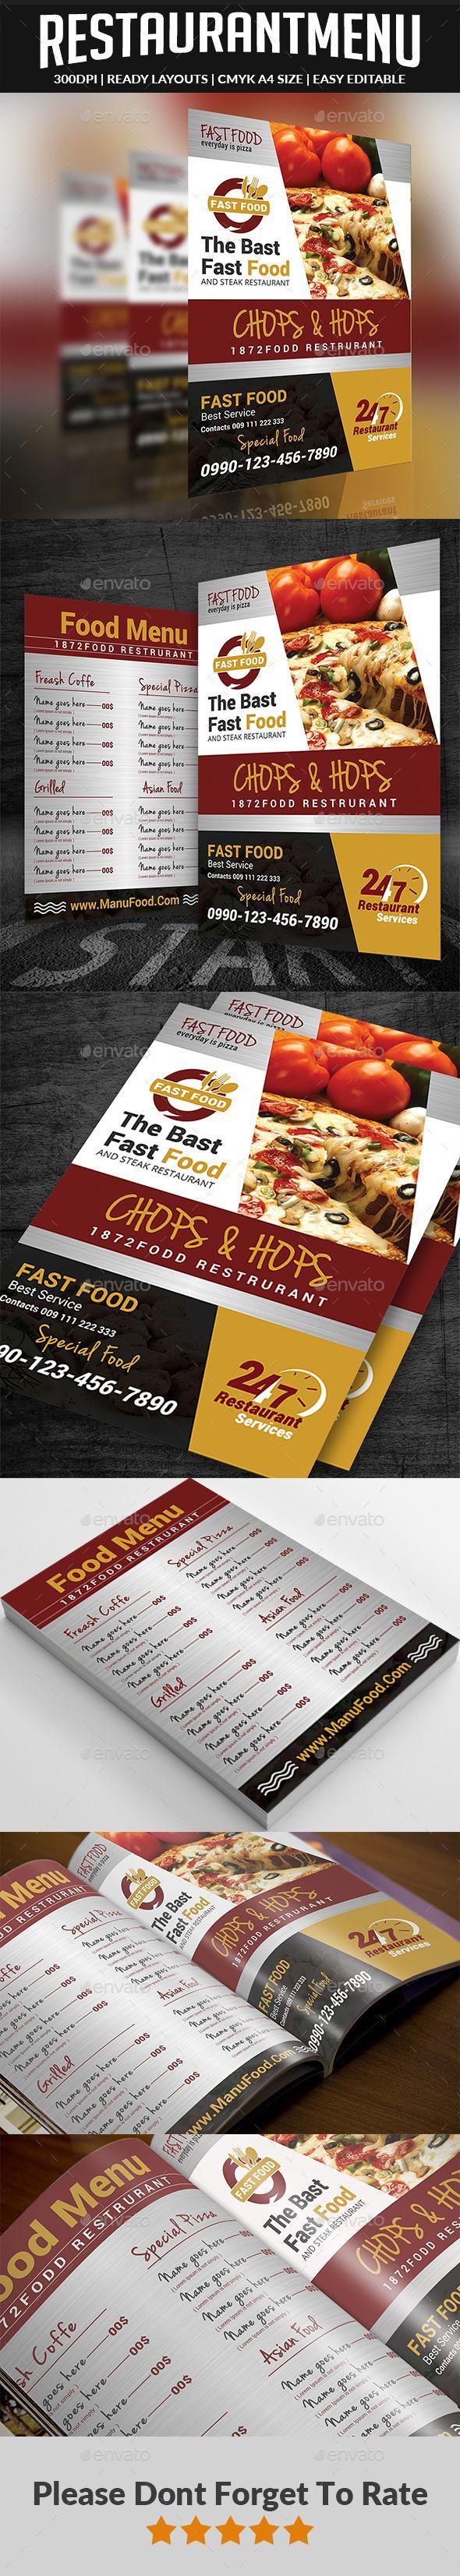 Restaurant Menu Flyer | Pinterest | Food menu, Print templates and ...